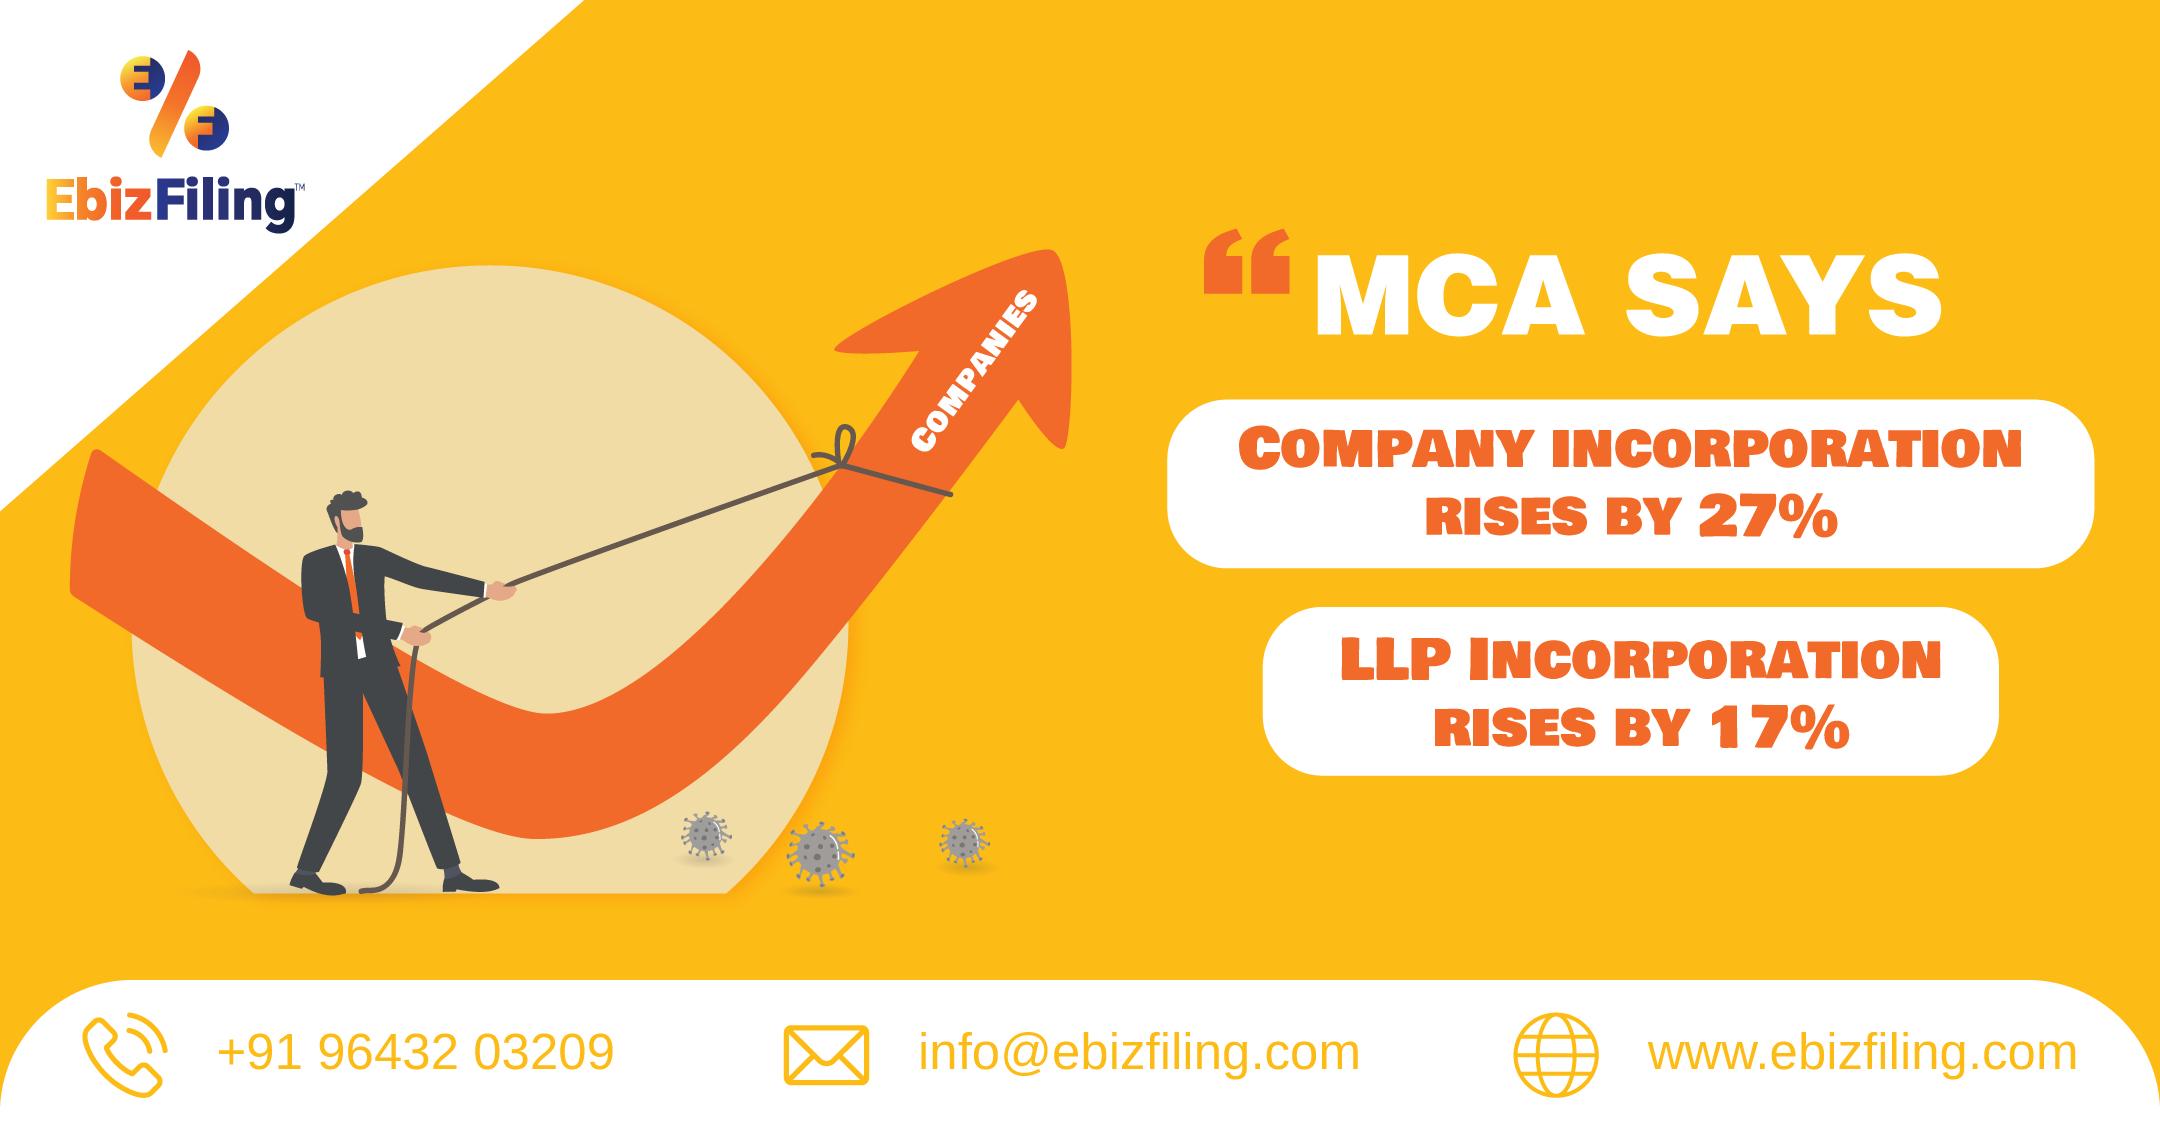 Company incorporation. LLP incorporation, Company incorporation rises by 27%, LLP Incorporation rises by 17%, Ebizfiling, Indian Subsidiary, Ebizfiling